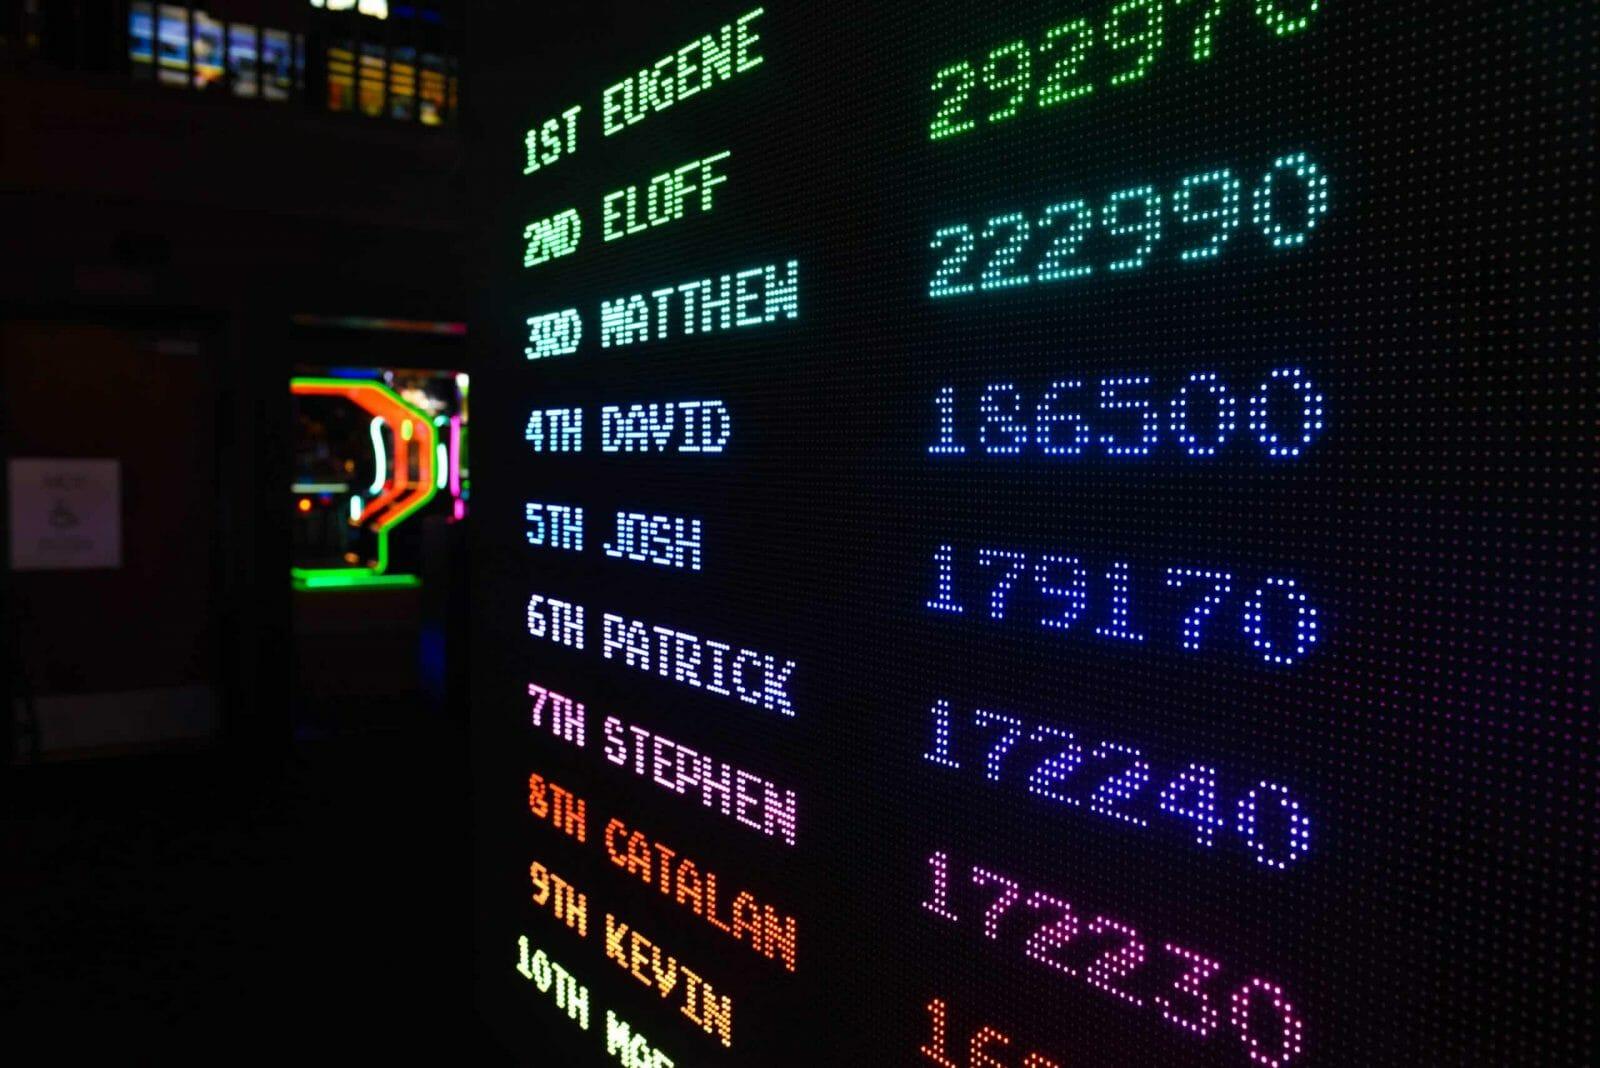 An image showing a scoreboard